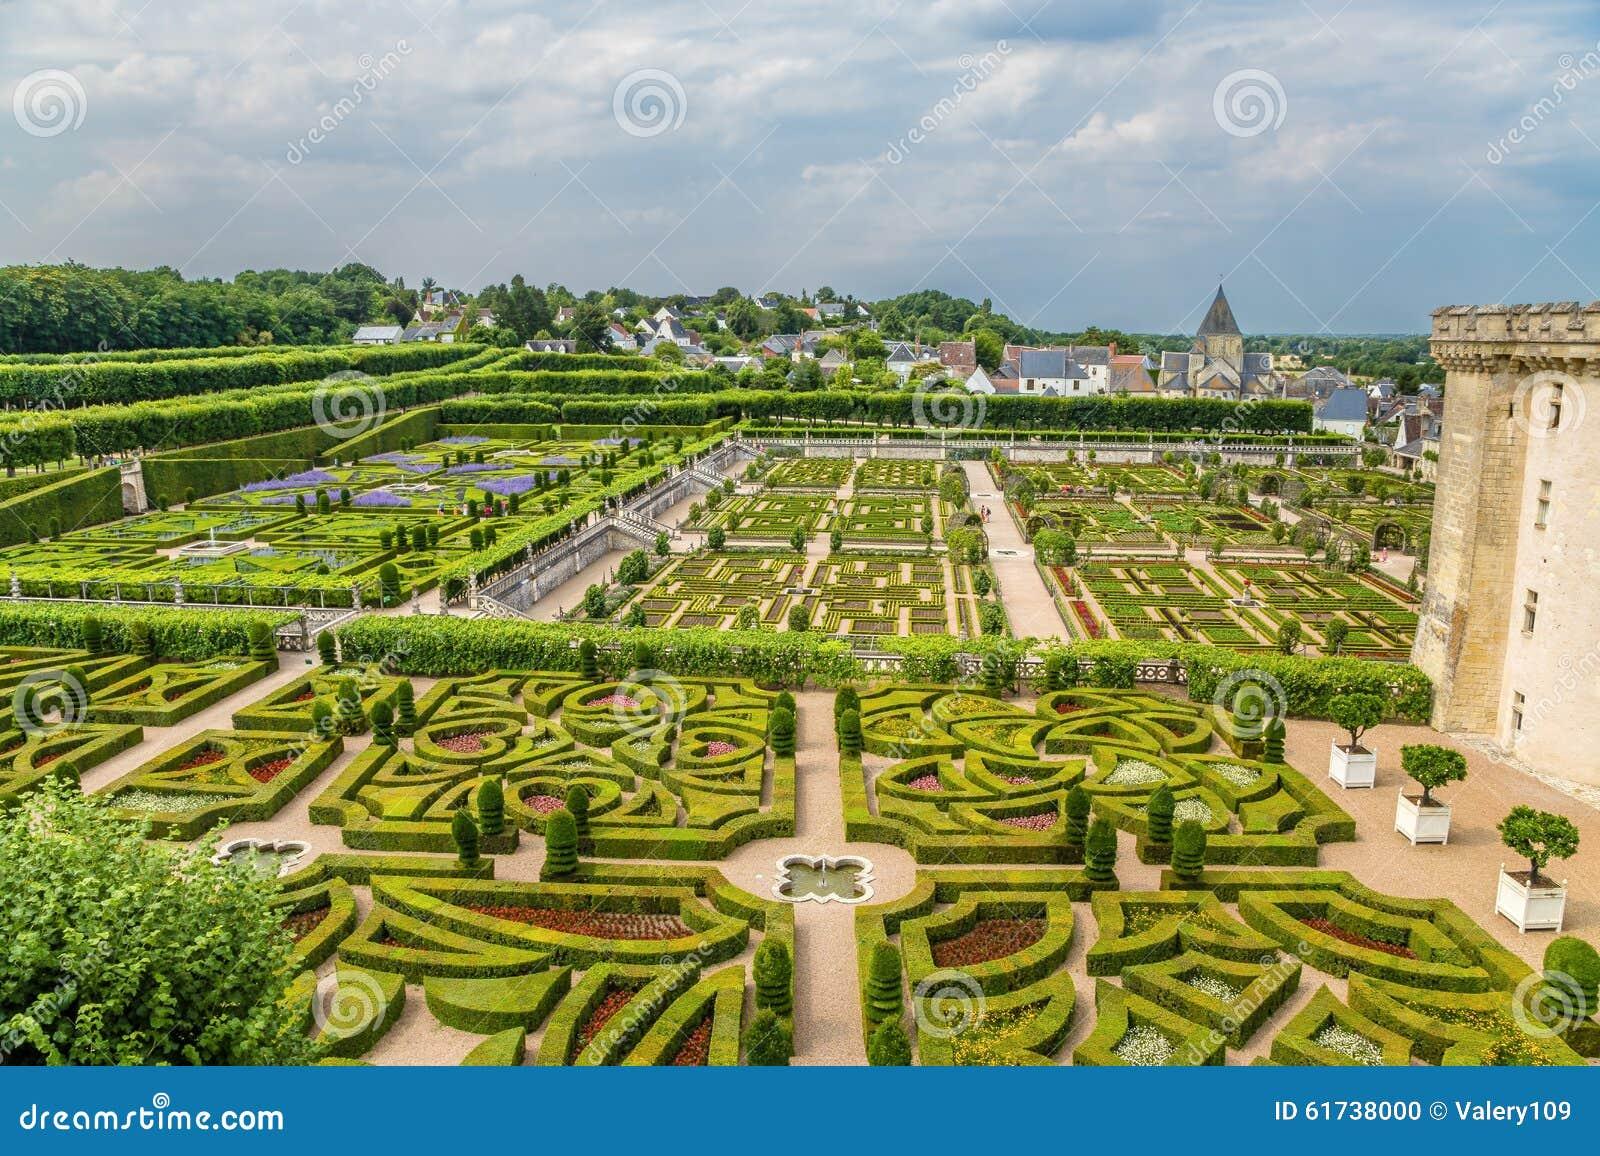 Chateau De Villandry France Donjon And Gardens Editorial Image